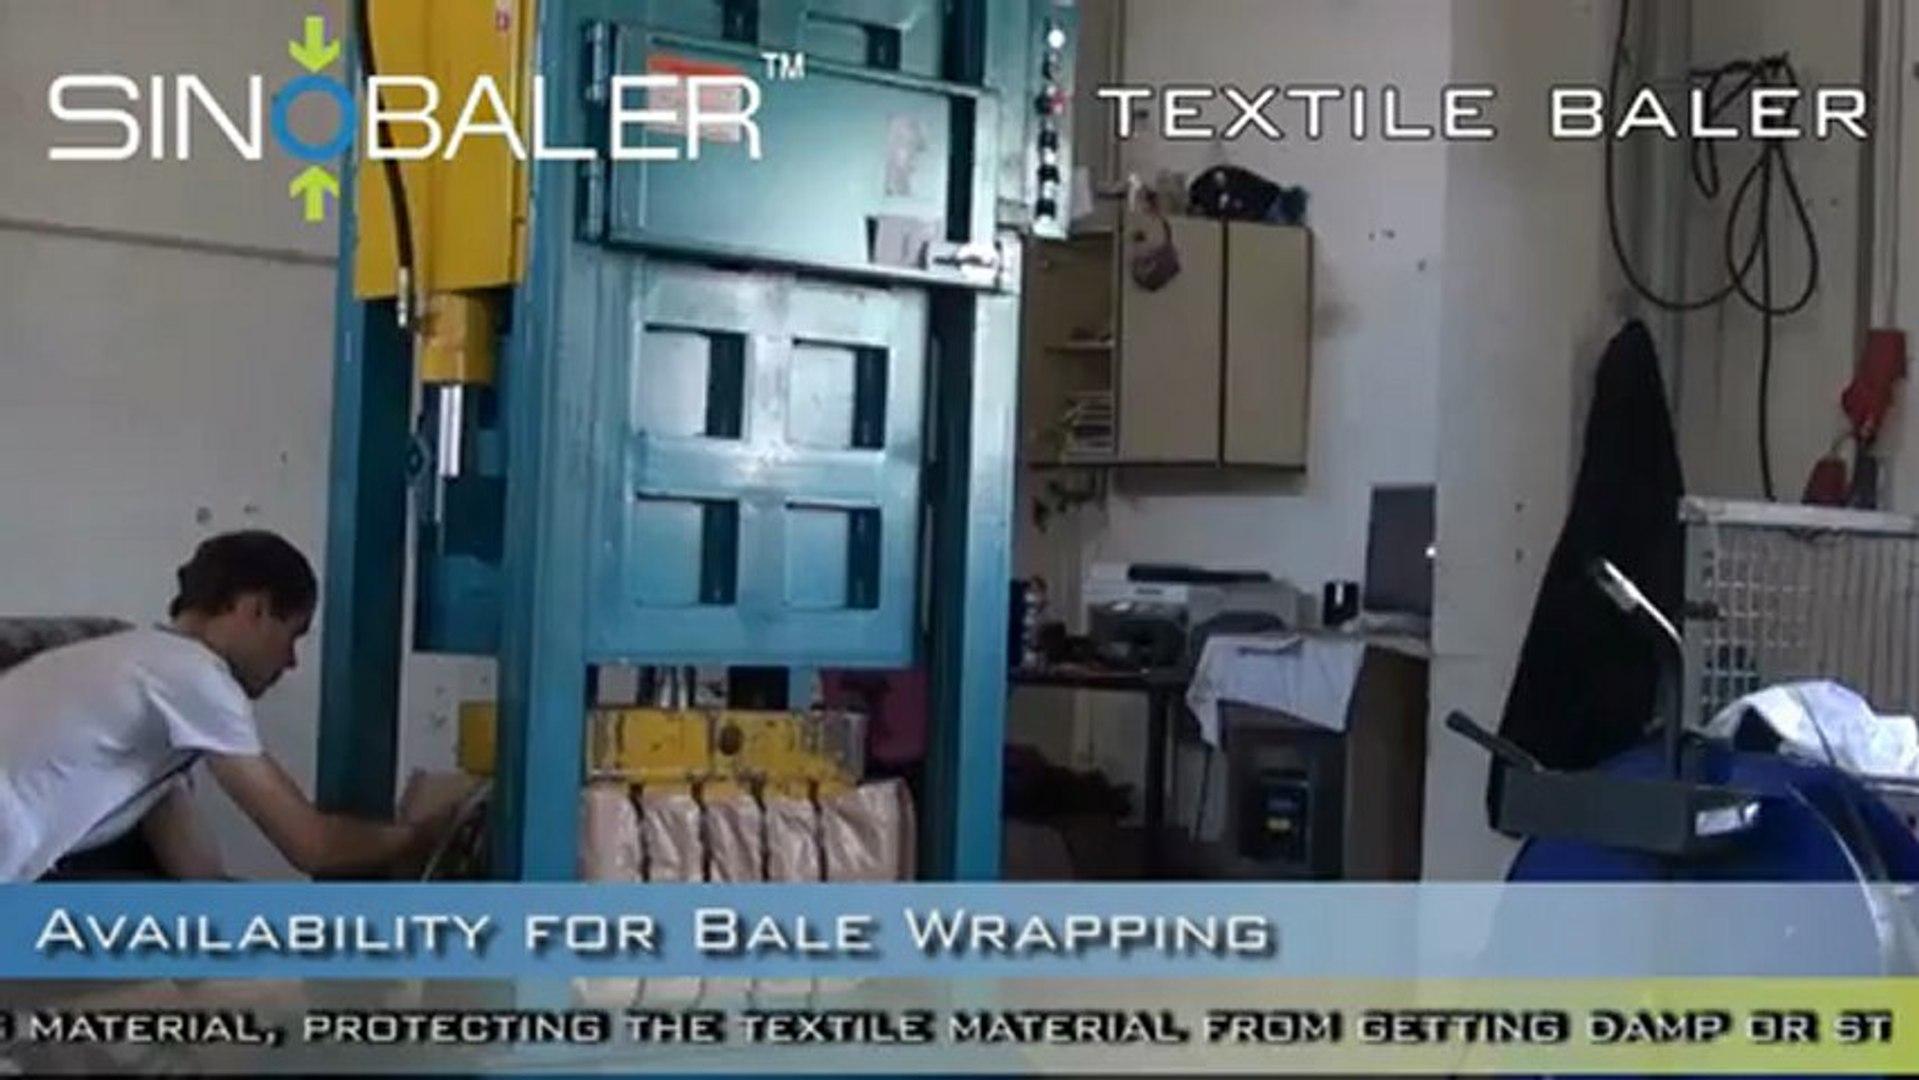 SINOBALER - Textile Baler, Clothes Baling Press, Clothes Baler, Clothes Recycling Equipment